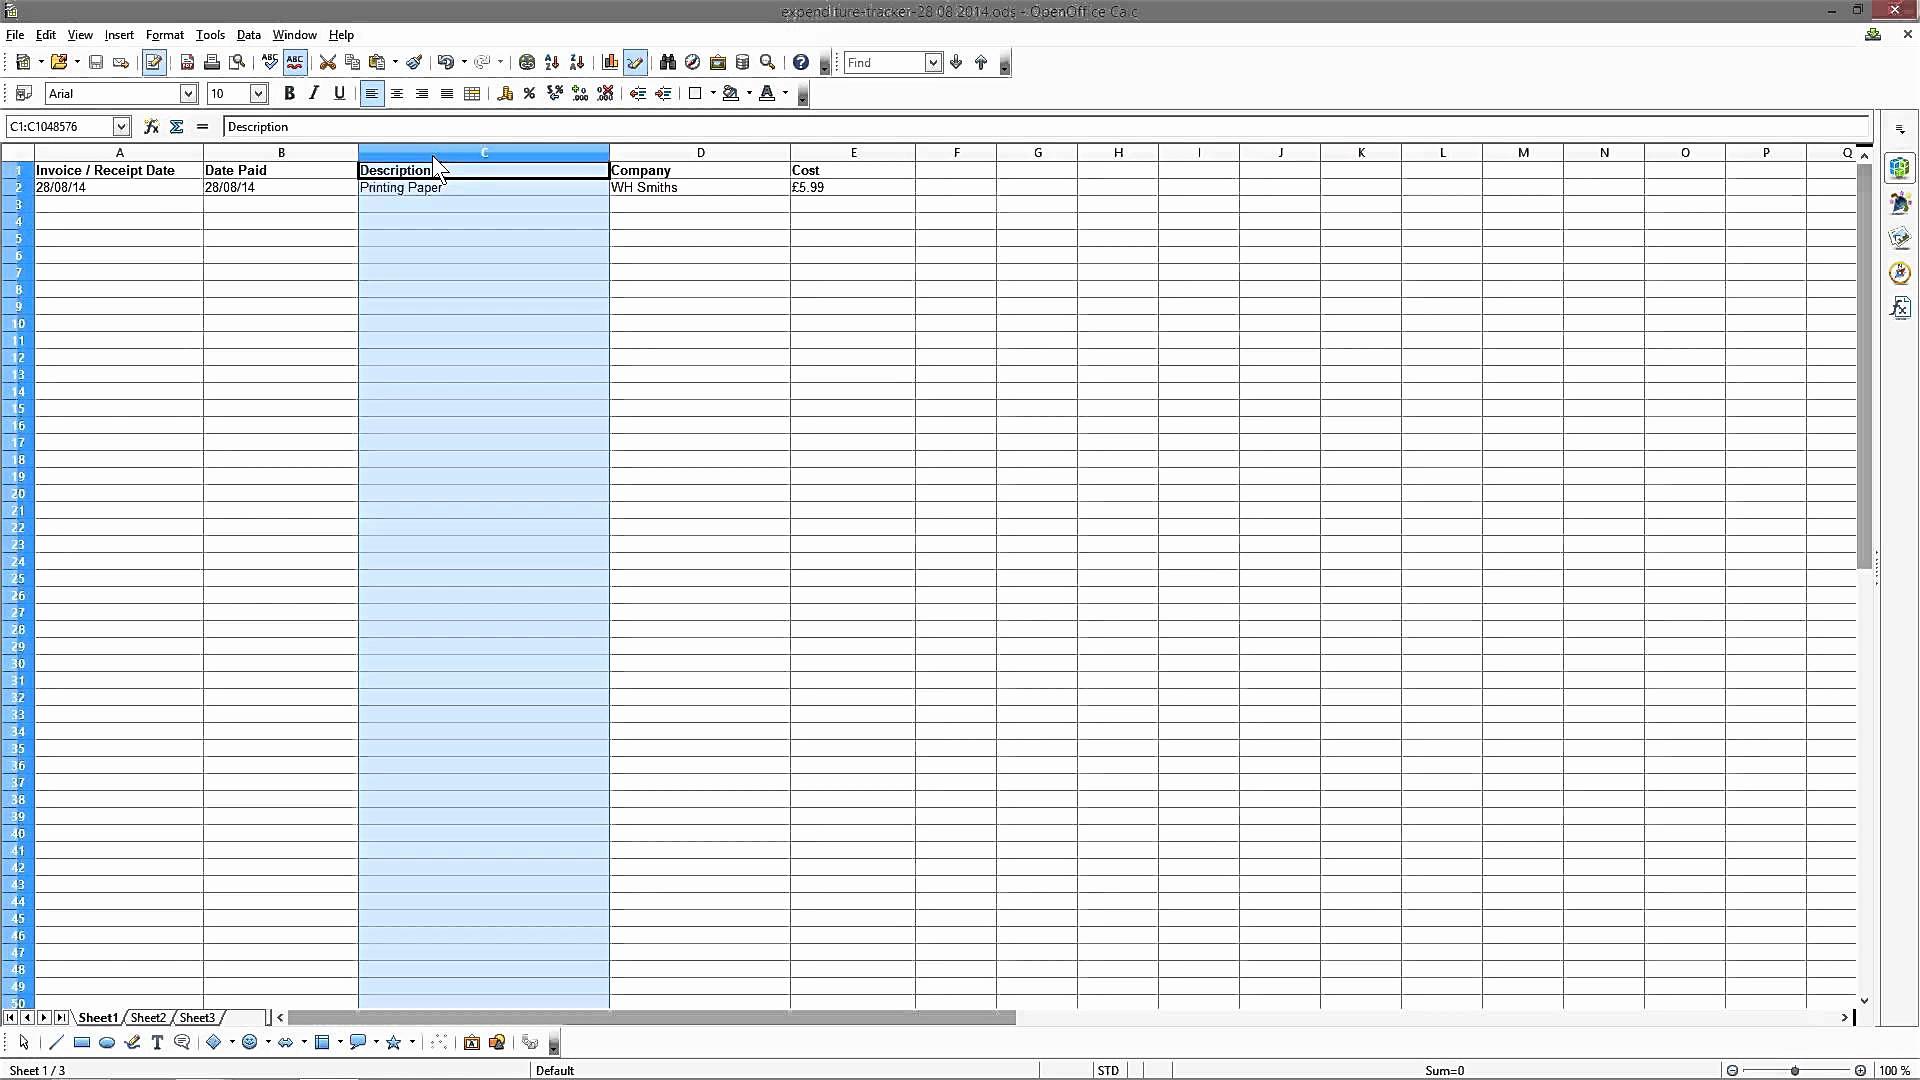 Madcow 5x5 Spreadsheet Madcow 5x5 Spreadsheet Types Of Spreadsheet Excel Spreadsheet For Small